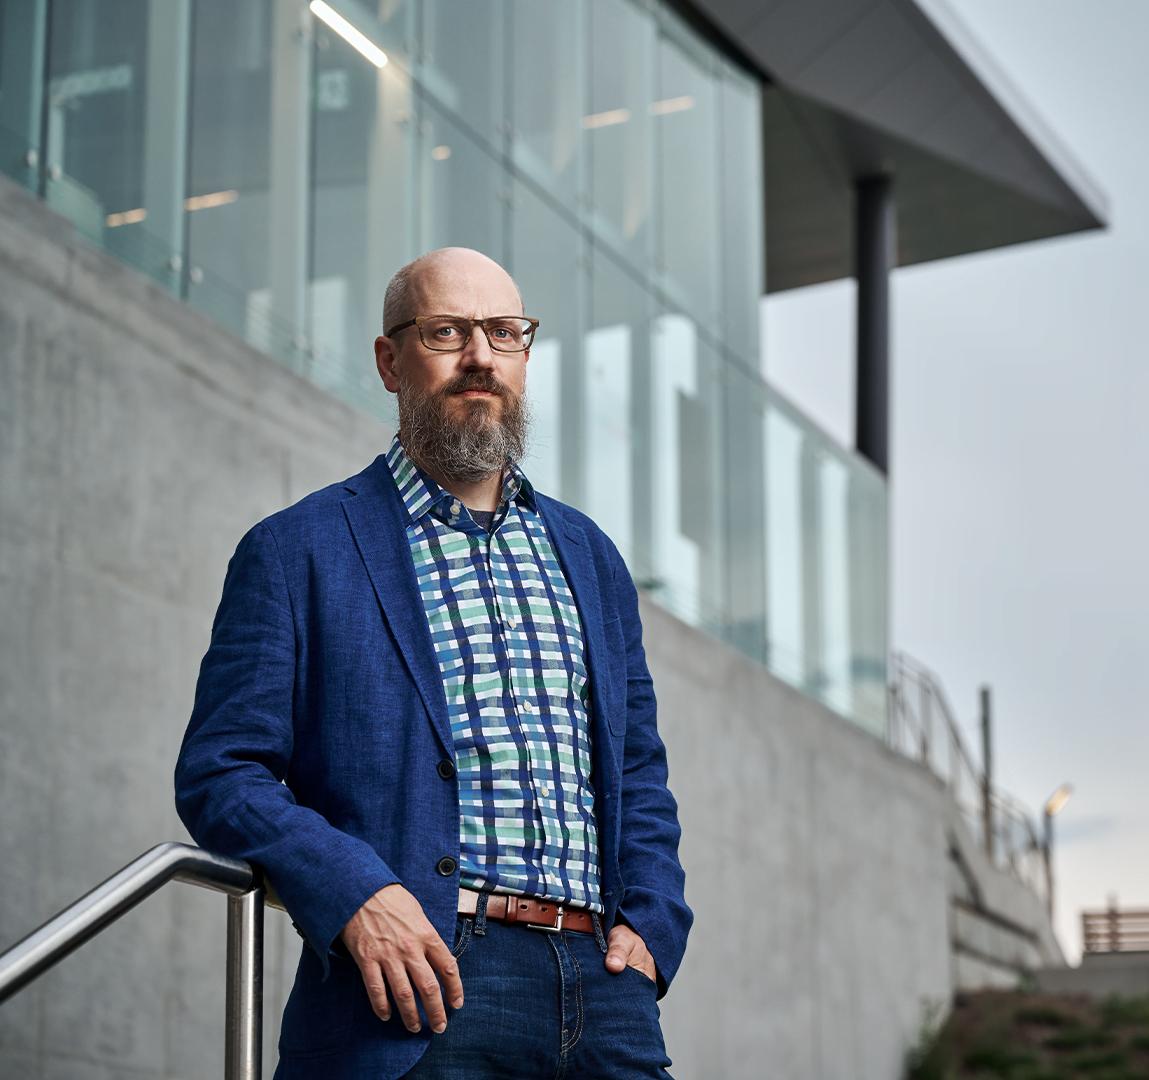 Portrait of Michael Spratt leaning on metal railing in front of industrial building